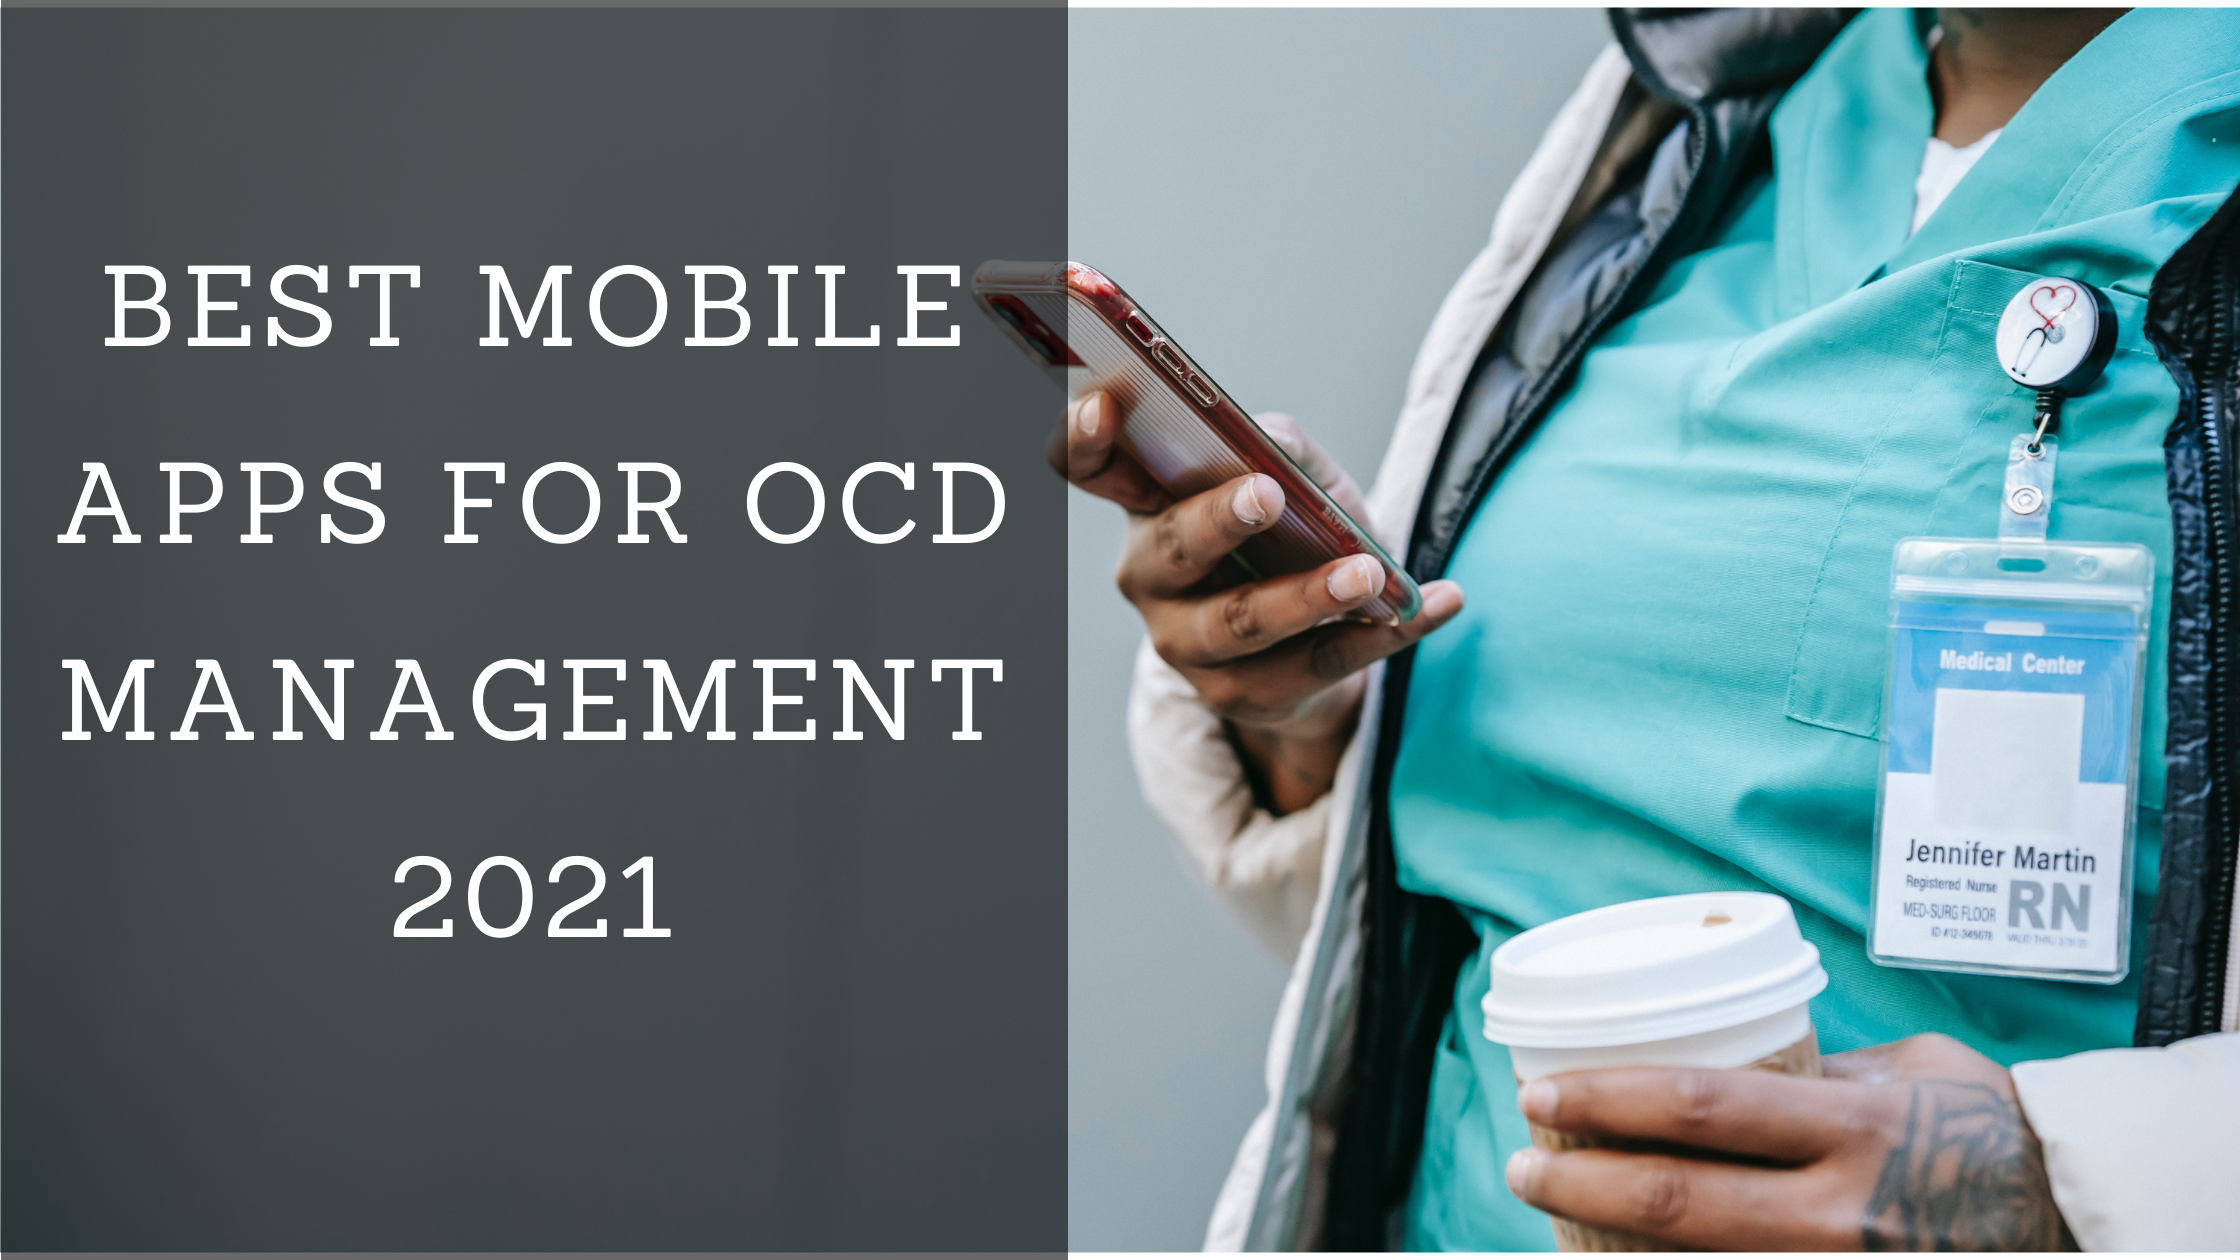 Best Mobile Apps for OCD Management 2021